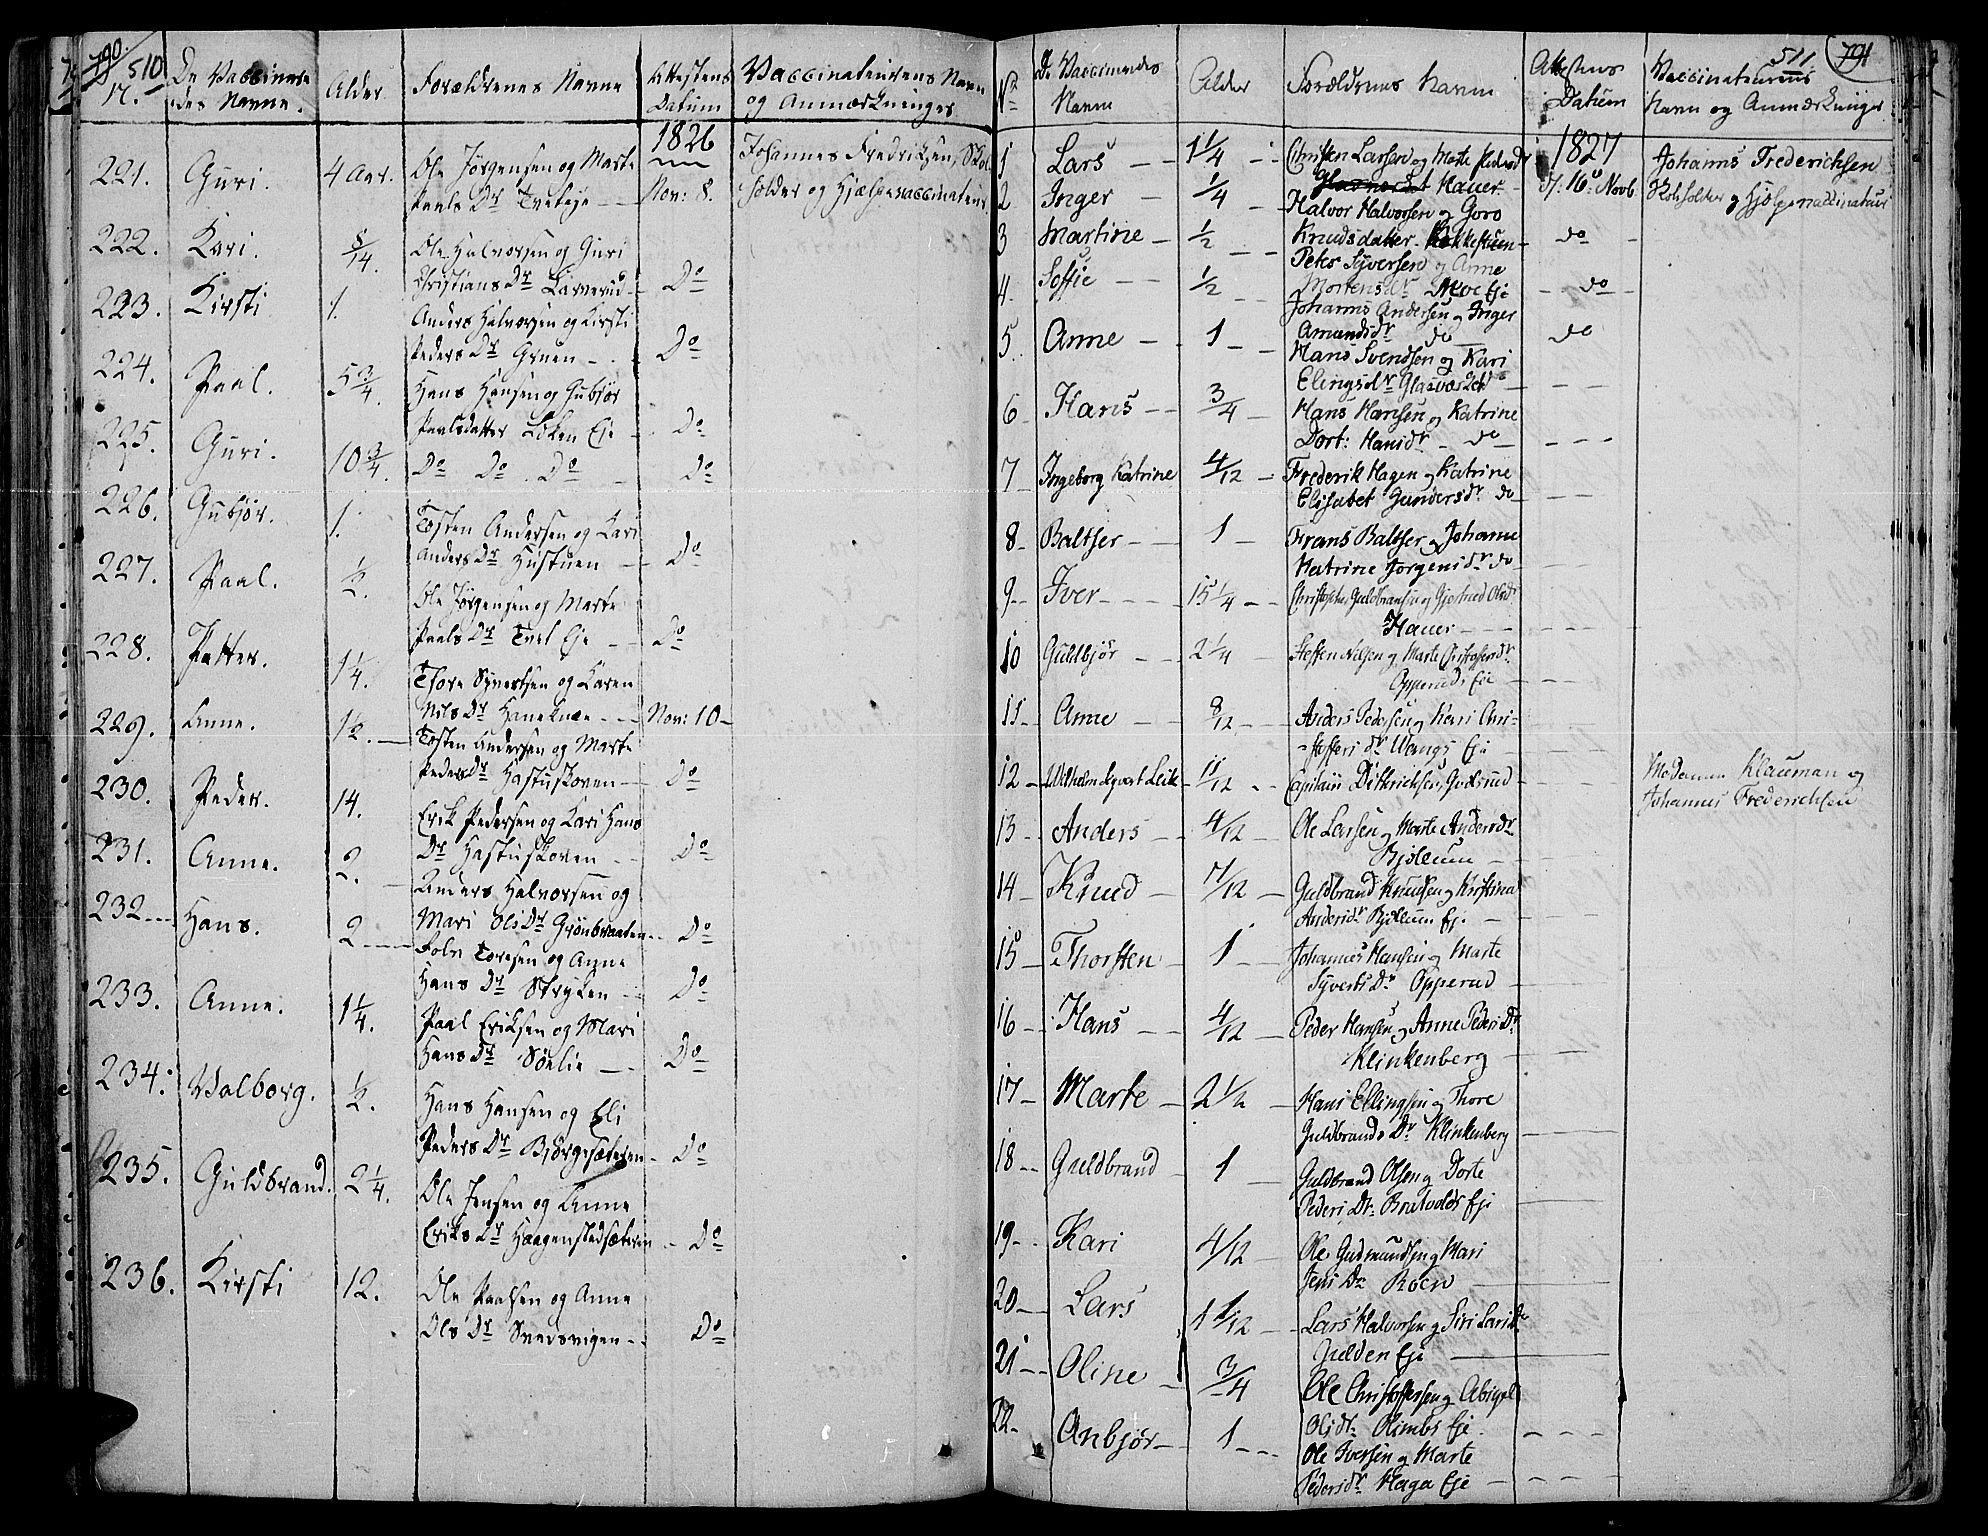 SAH, Jevnaker prestekontor, Ministerialbok nr. 4, 1800-1861, s. 510-511